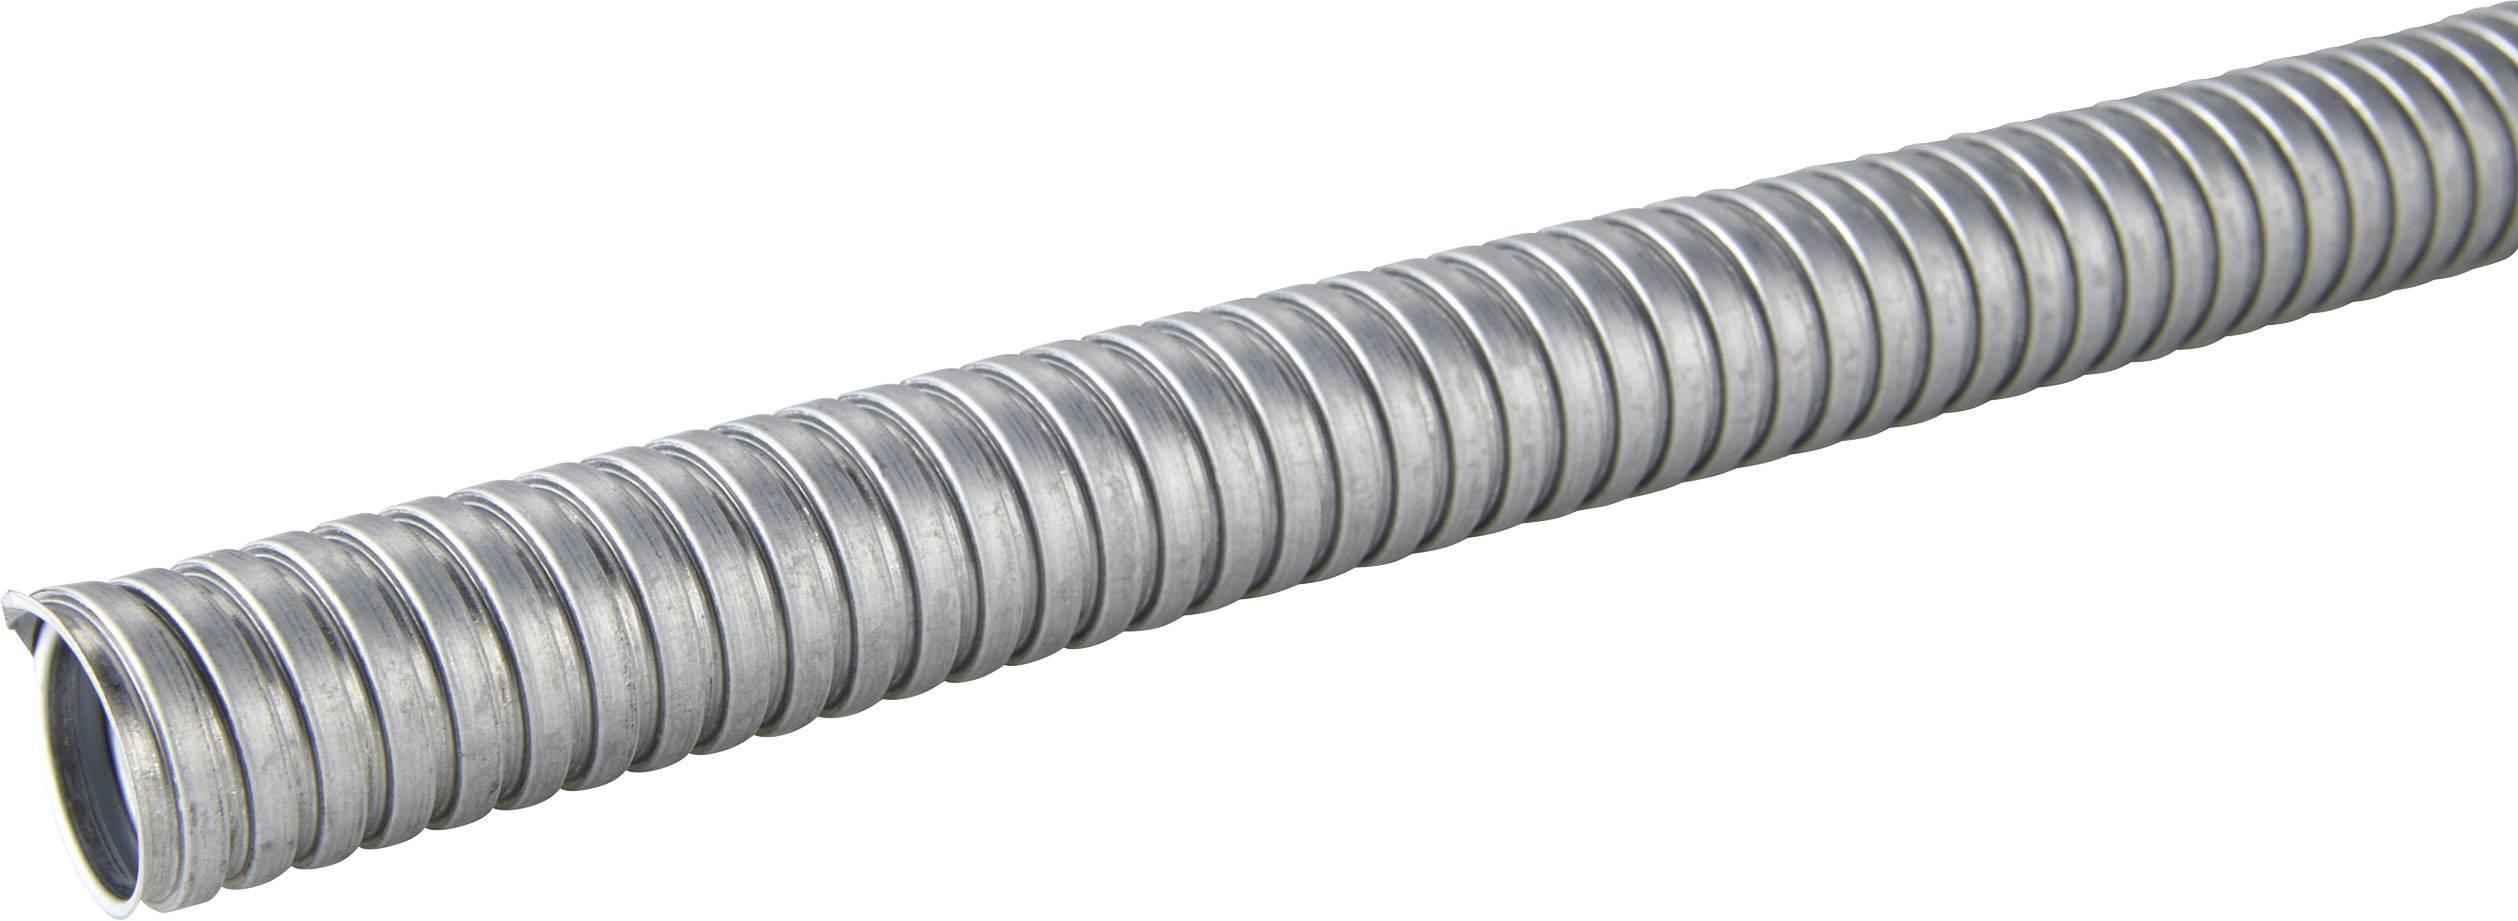 Ochranná hadice na kov LappKabel SILVYN® AS 29/31x36 61802140, stříbrná, 25 m